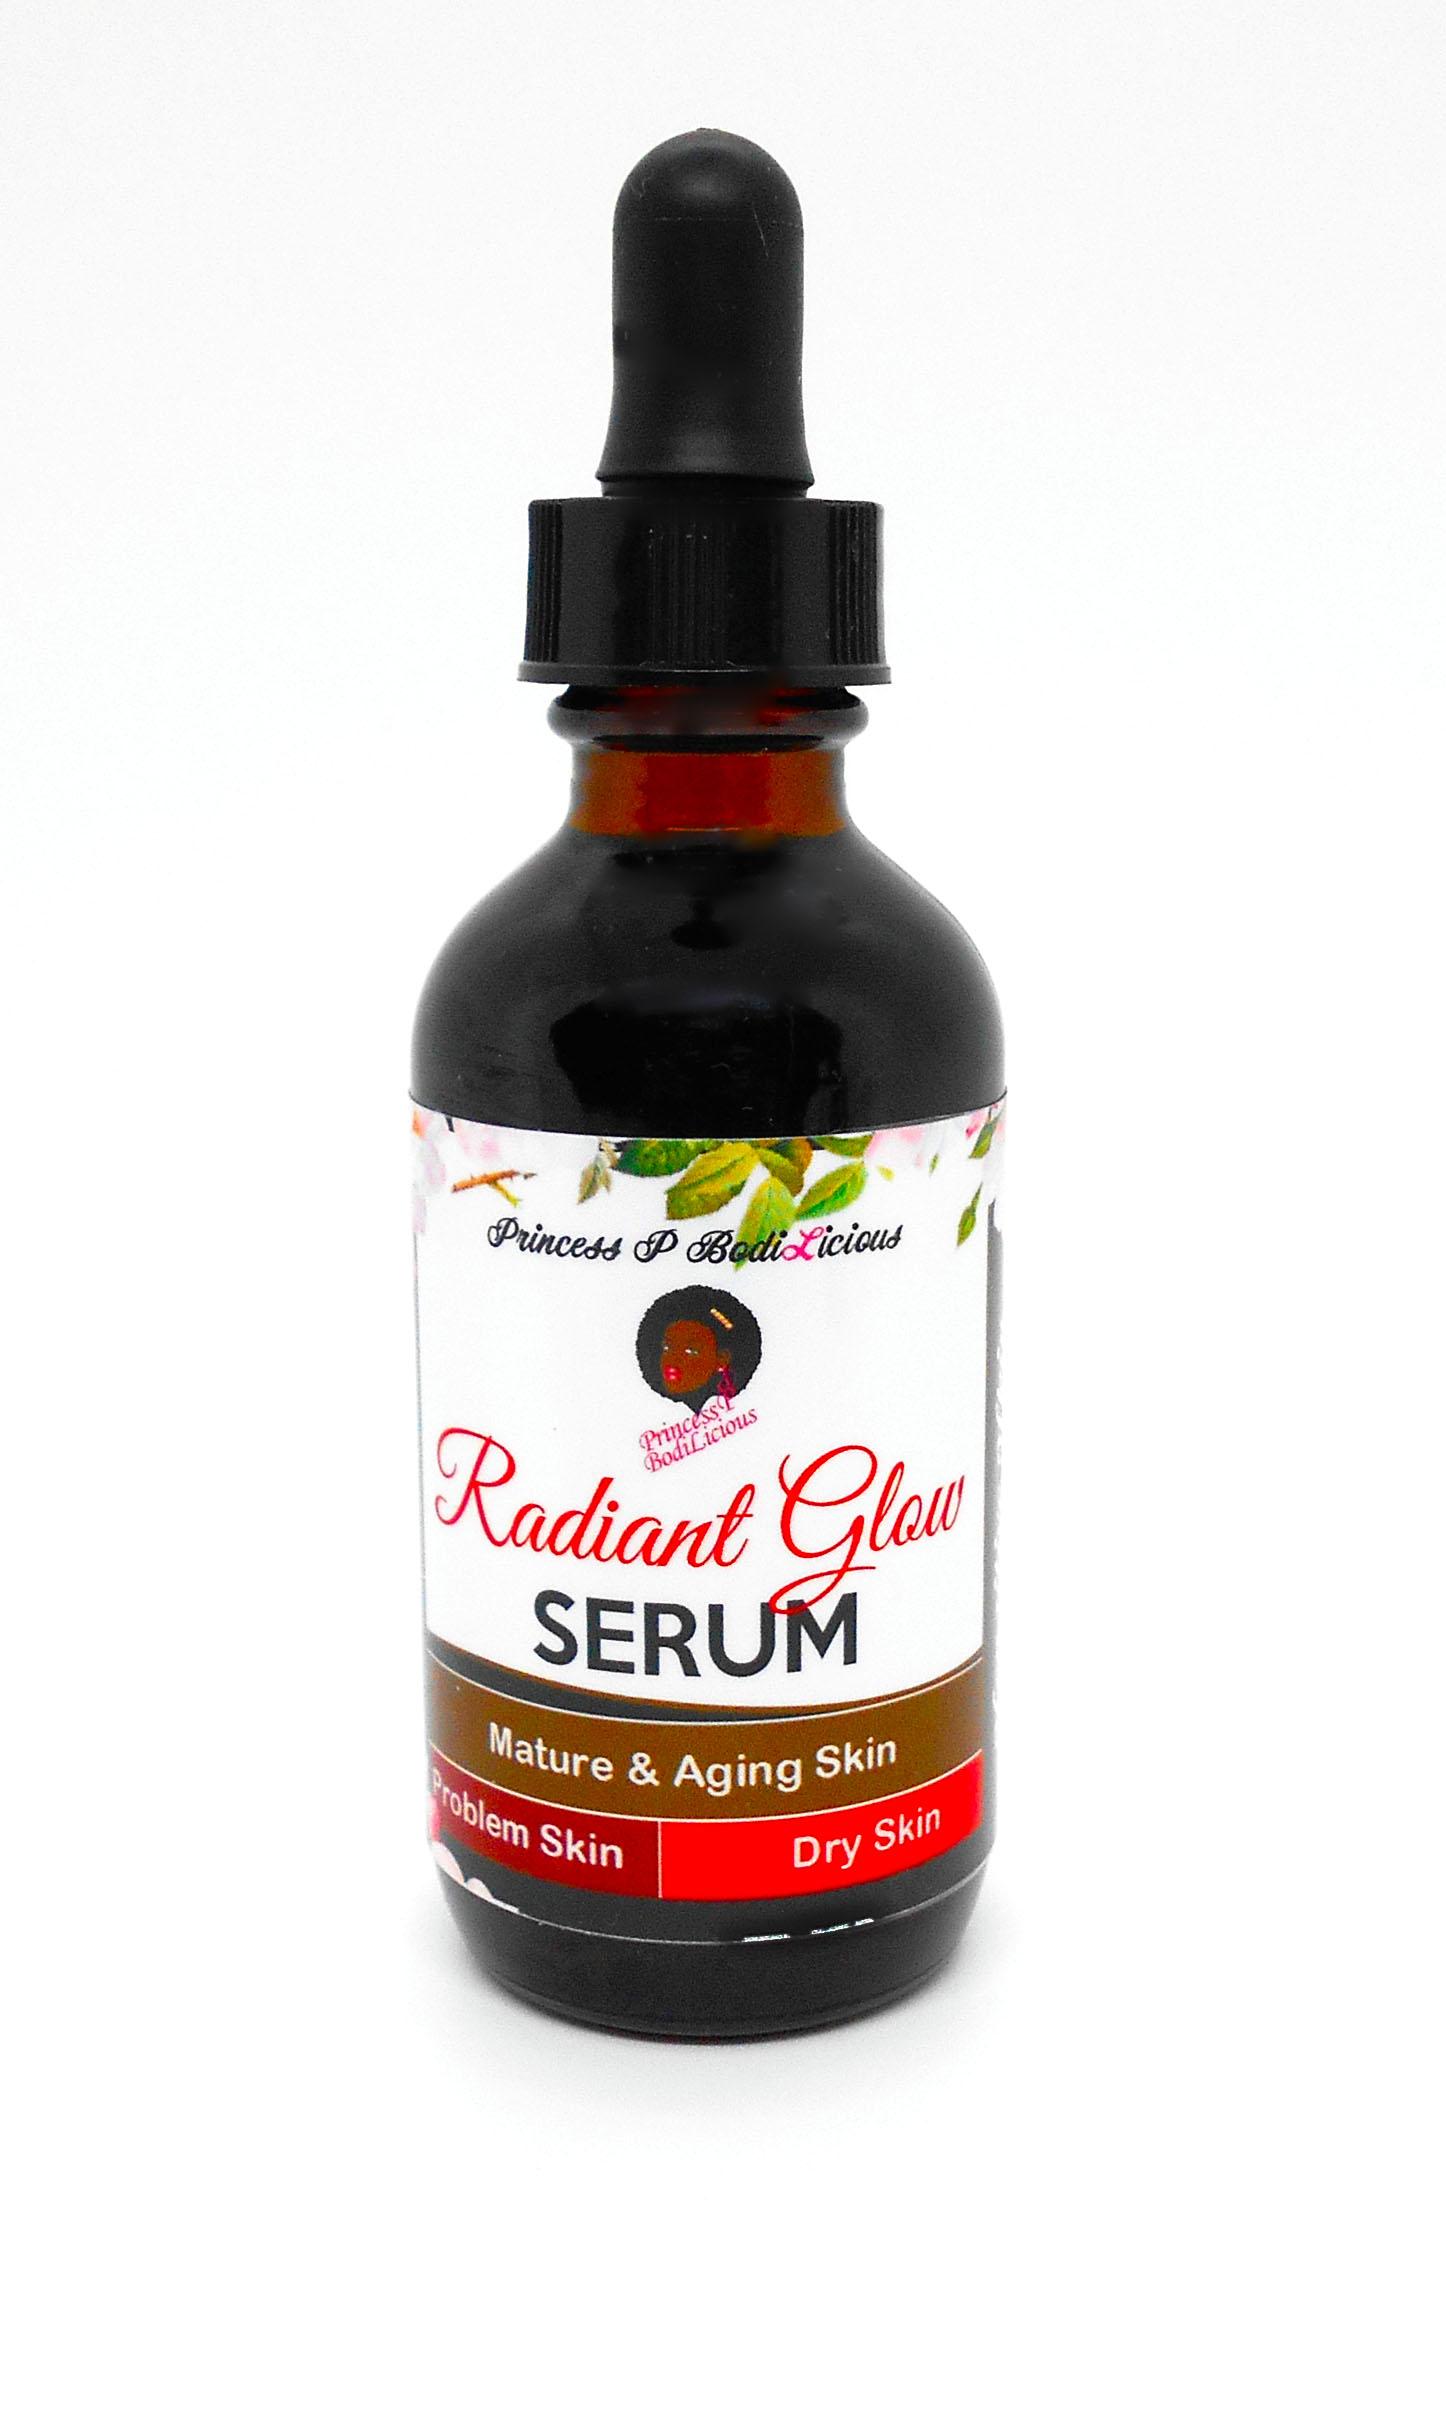 Radiant Glow Serum